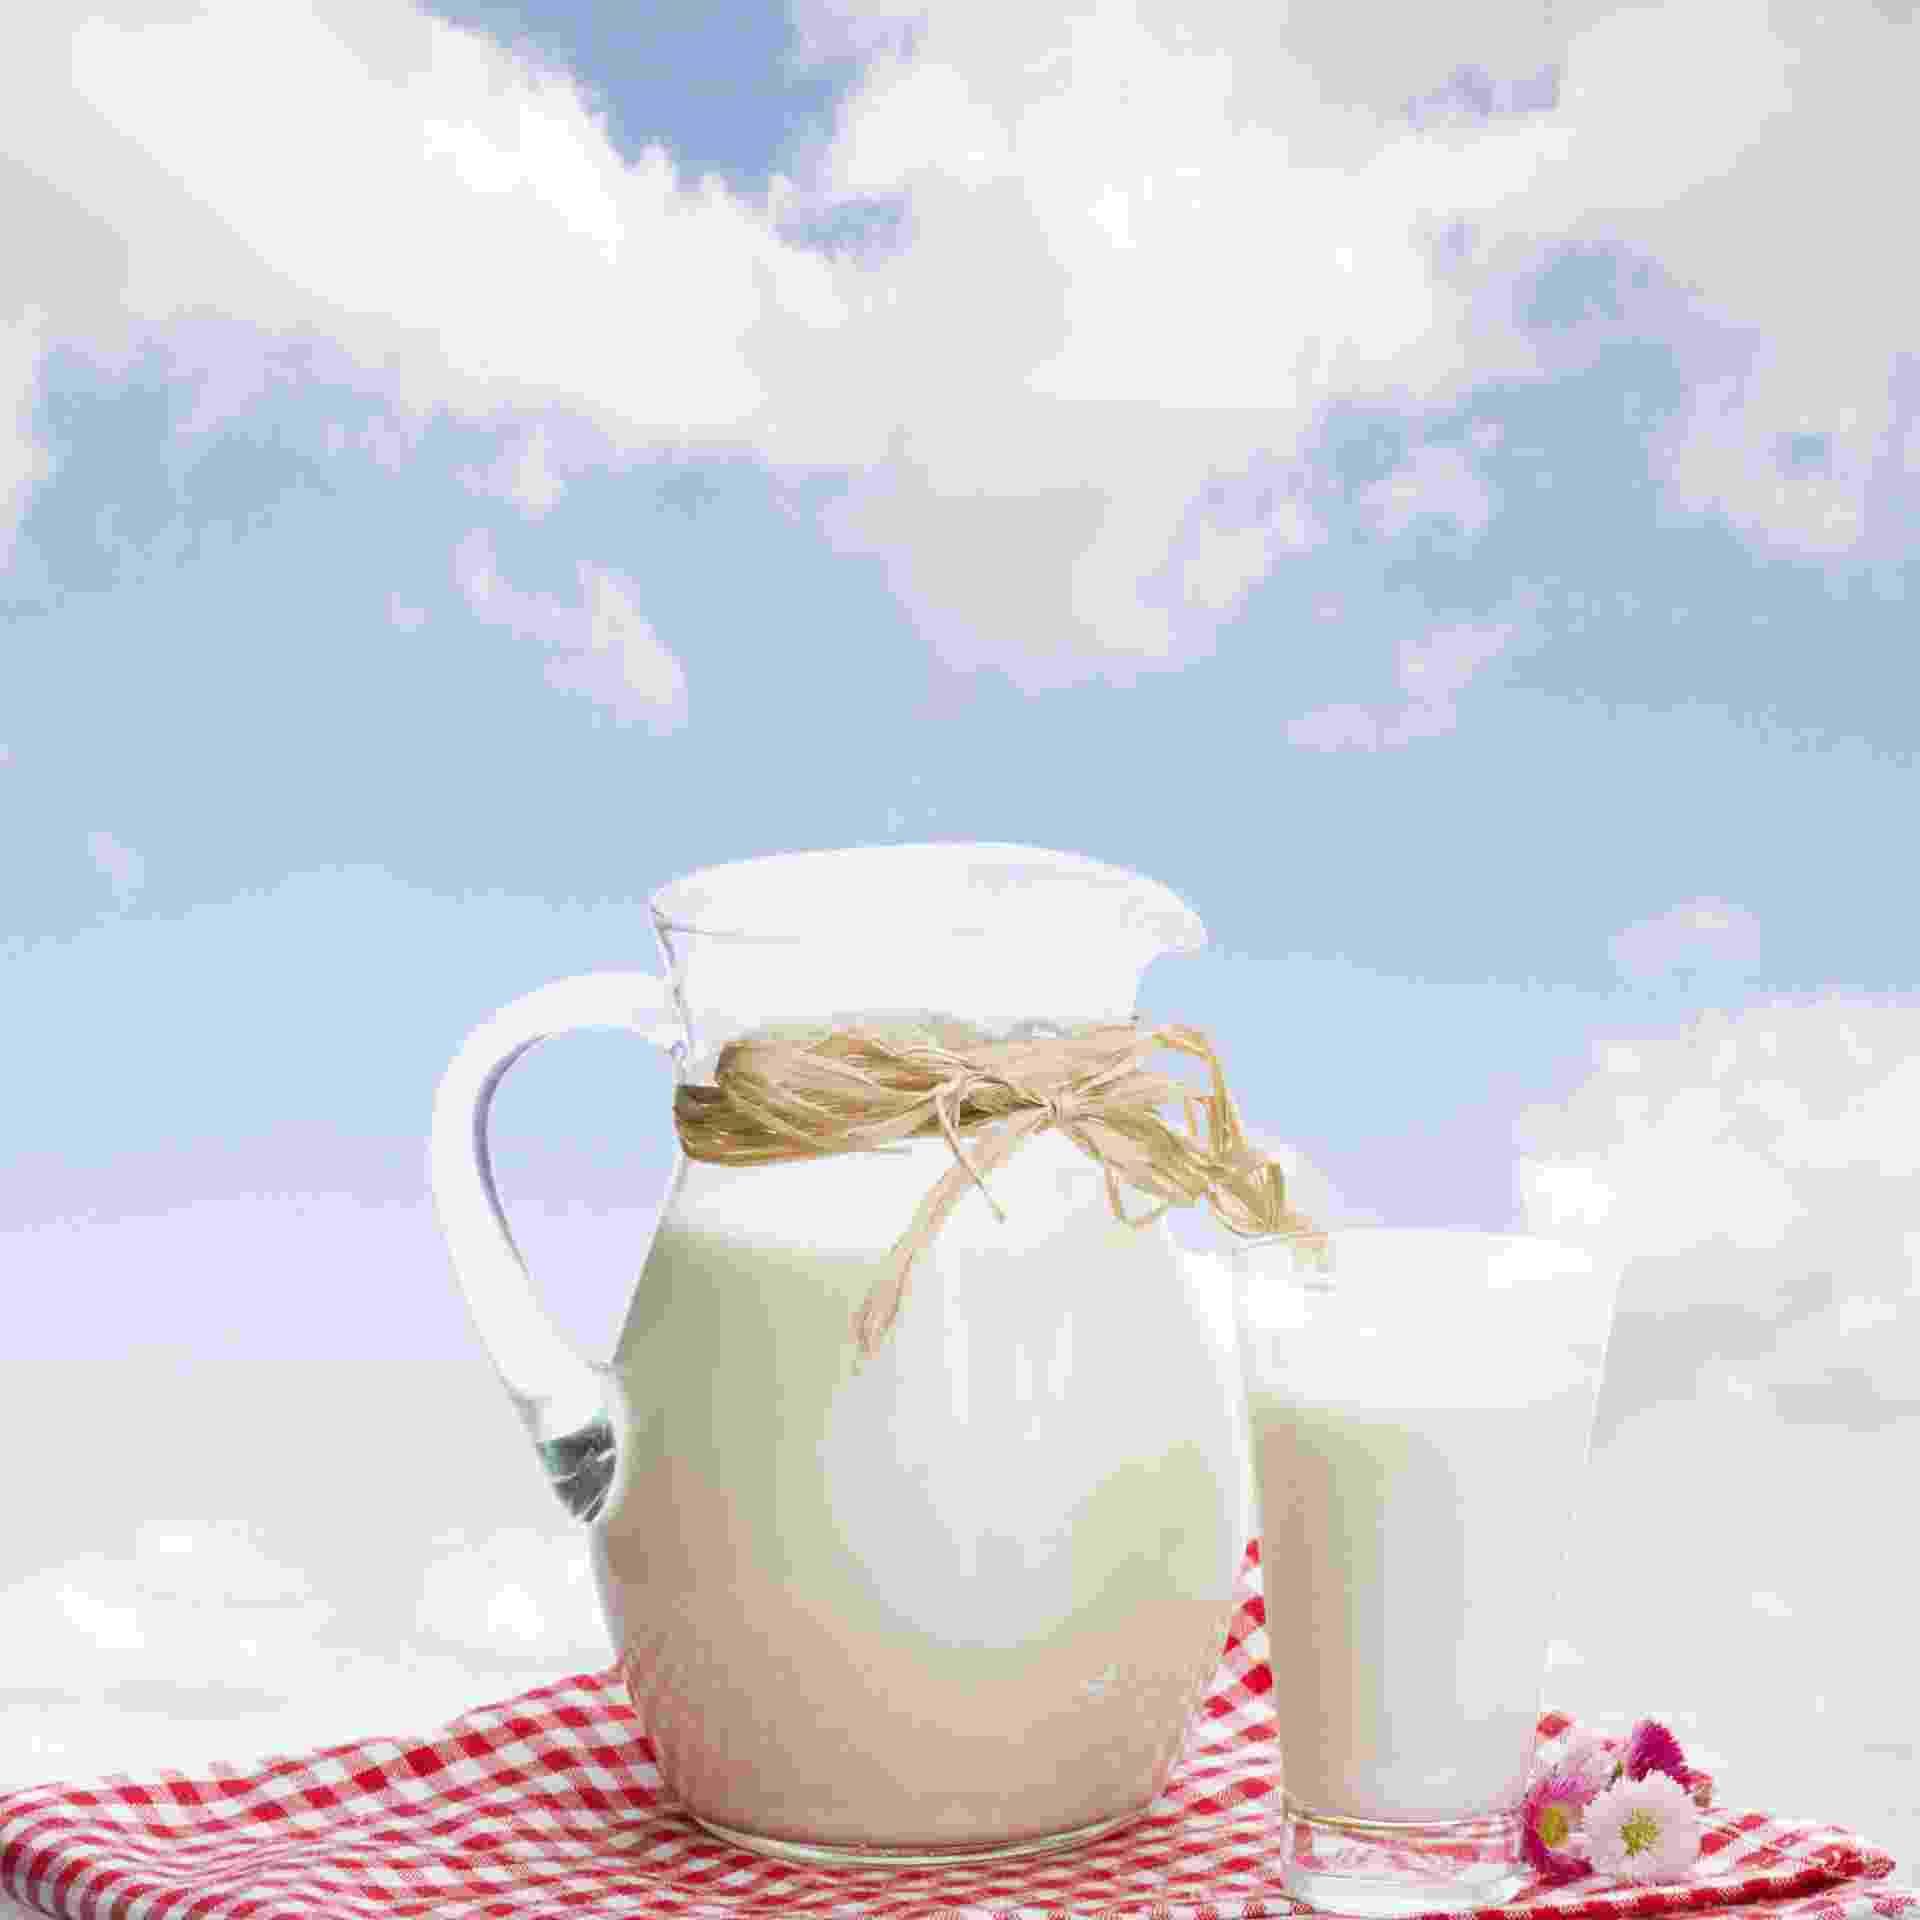 jarra e copo de leite, leite integral - Getty Images/iStockphoto